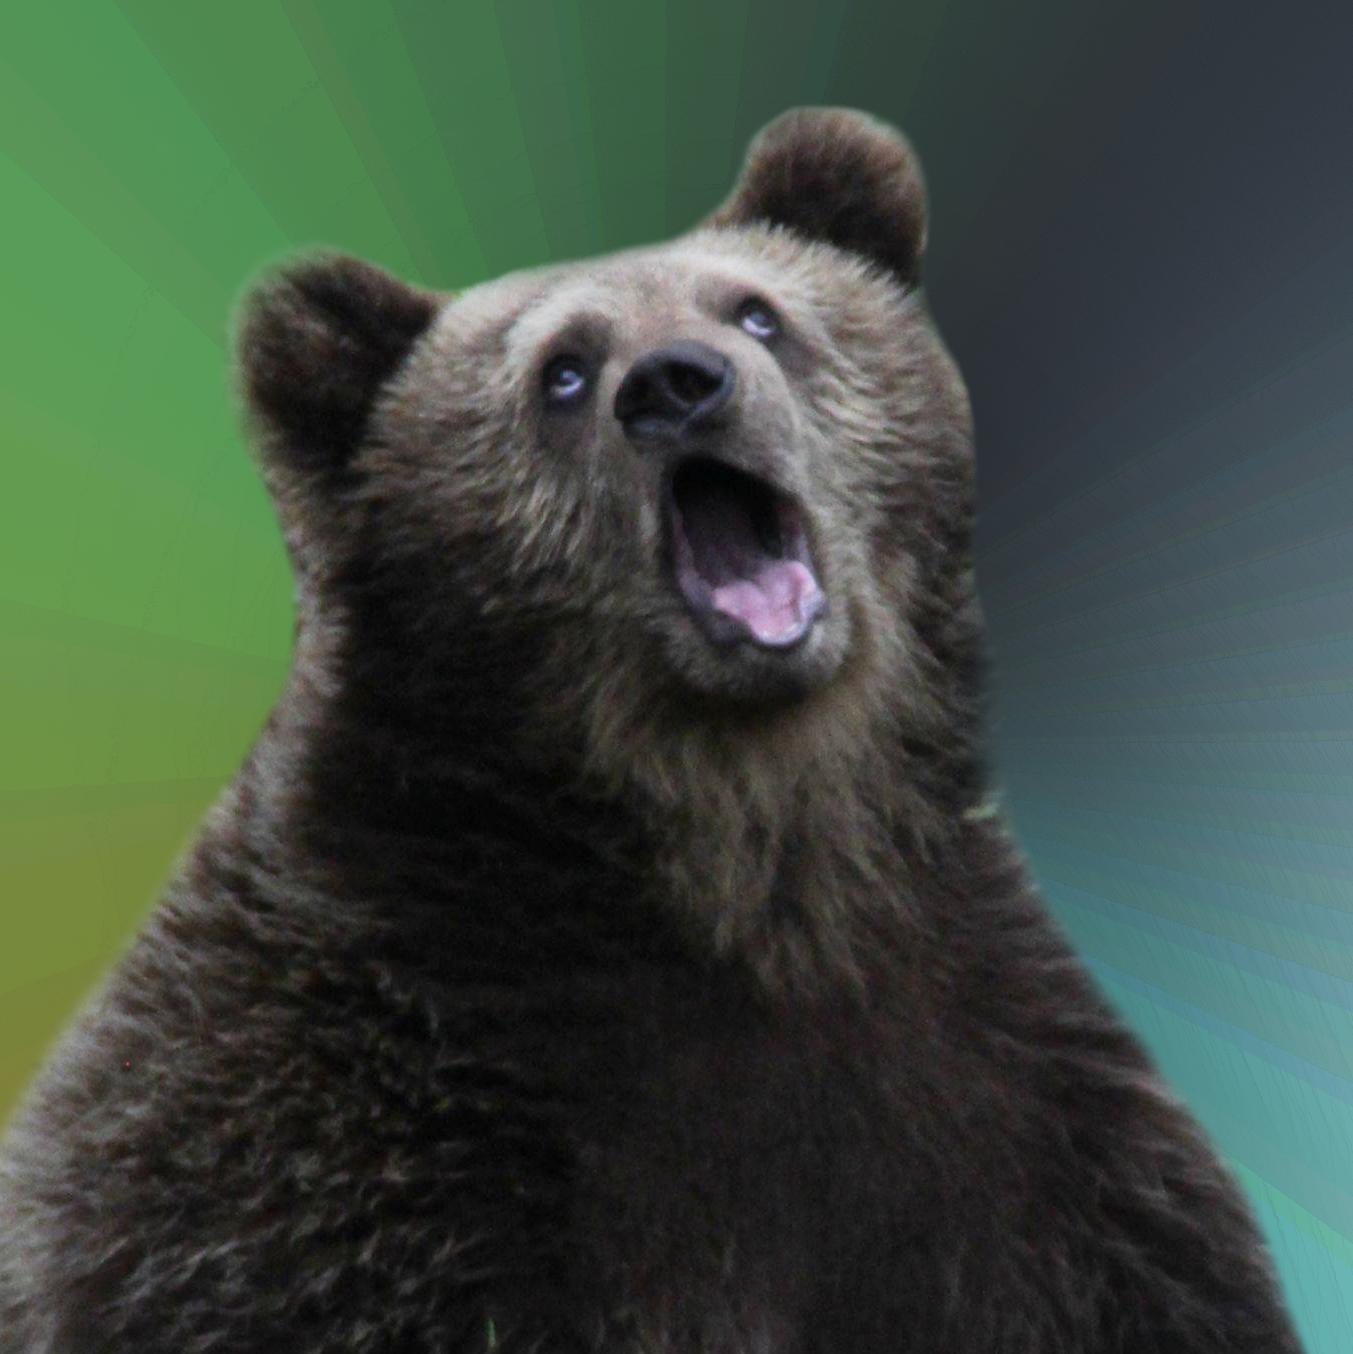 00000001 sarcastic bear know your meme